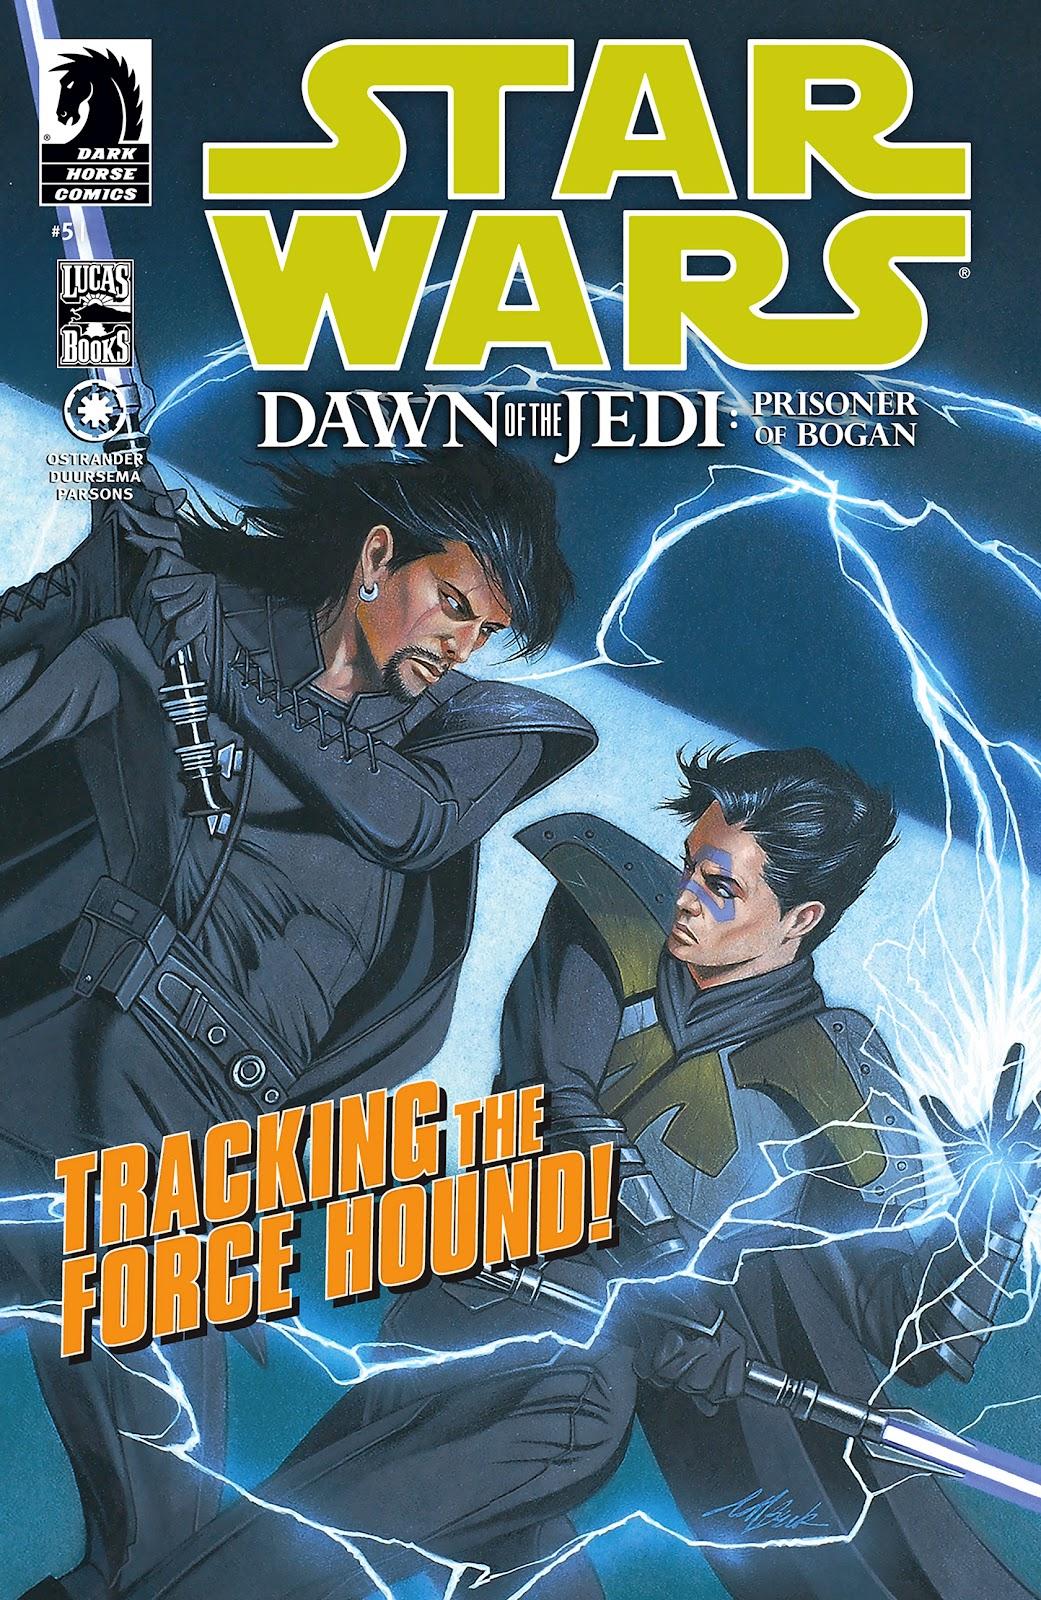 Star Wars: Dawn of the Jedi - Prisoner of Bogan issue 5 - Page 1